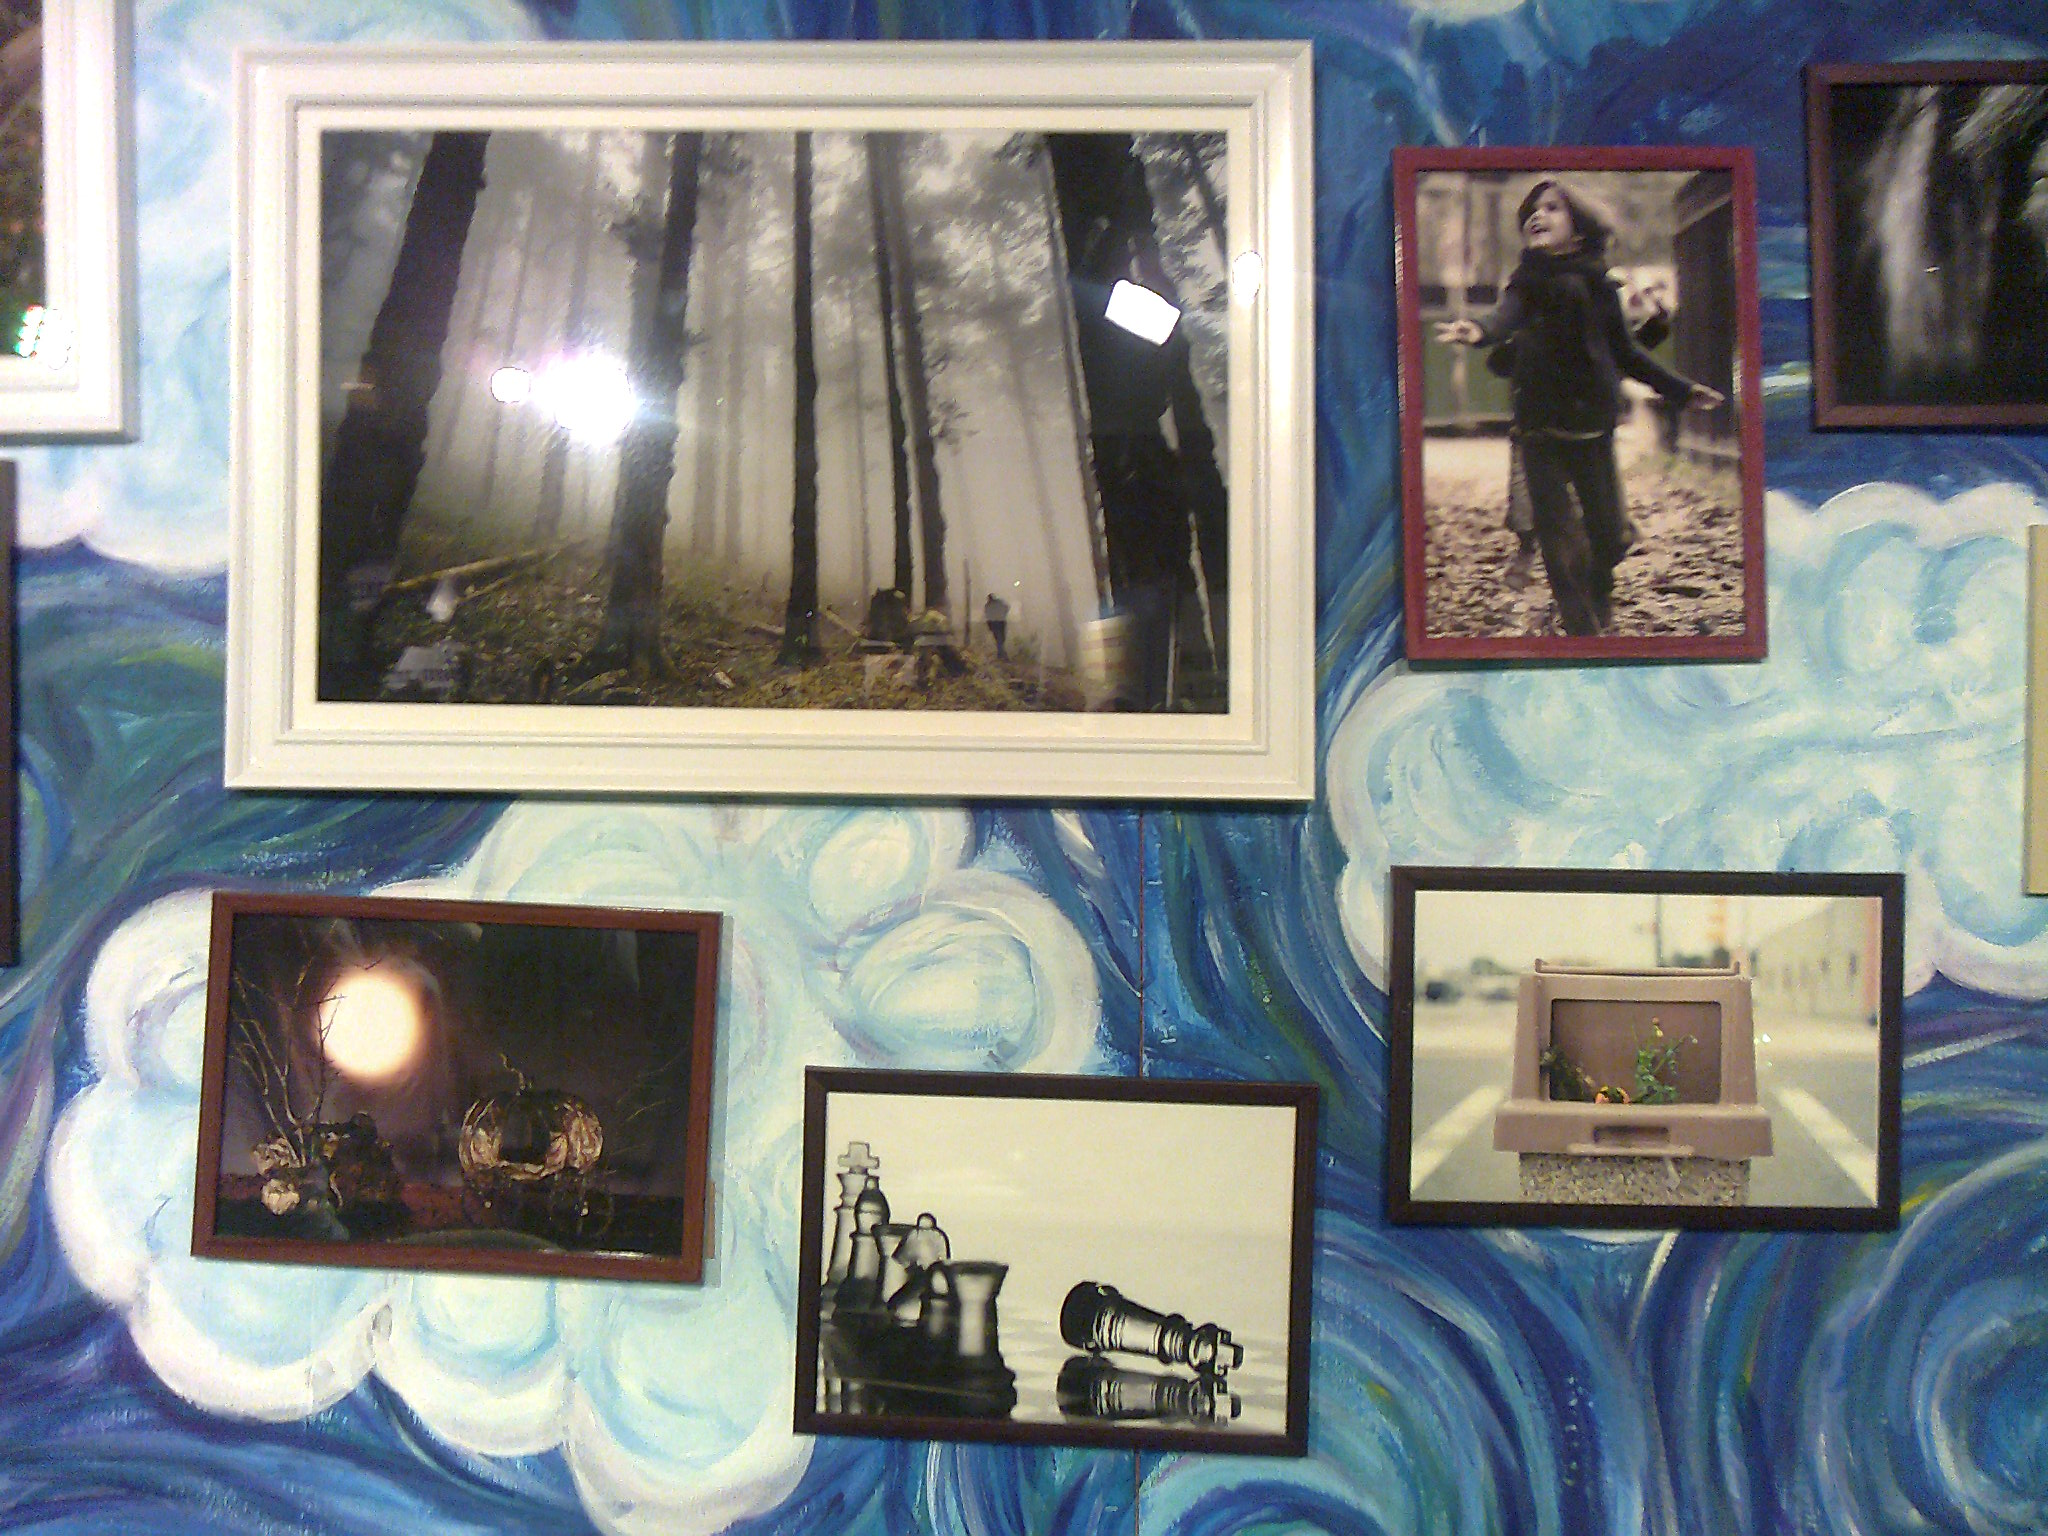 Fotokunst der Bezalel Akademie